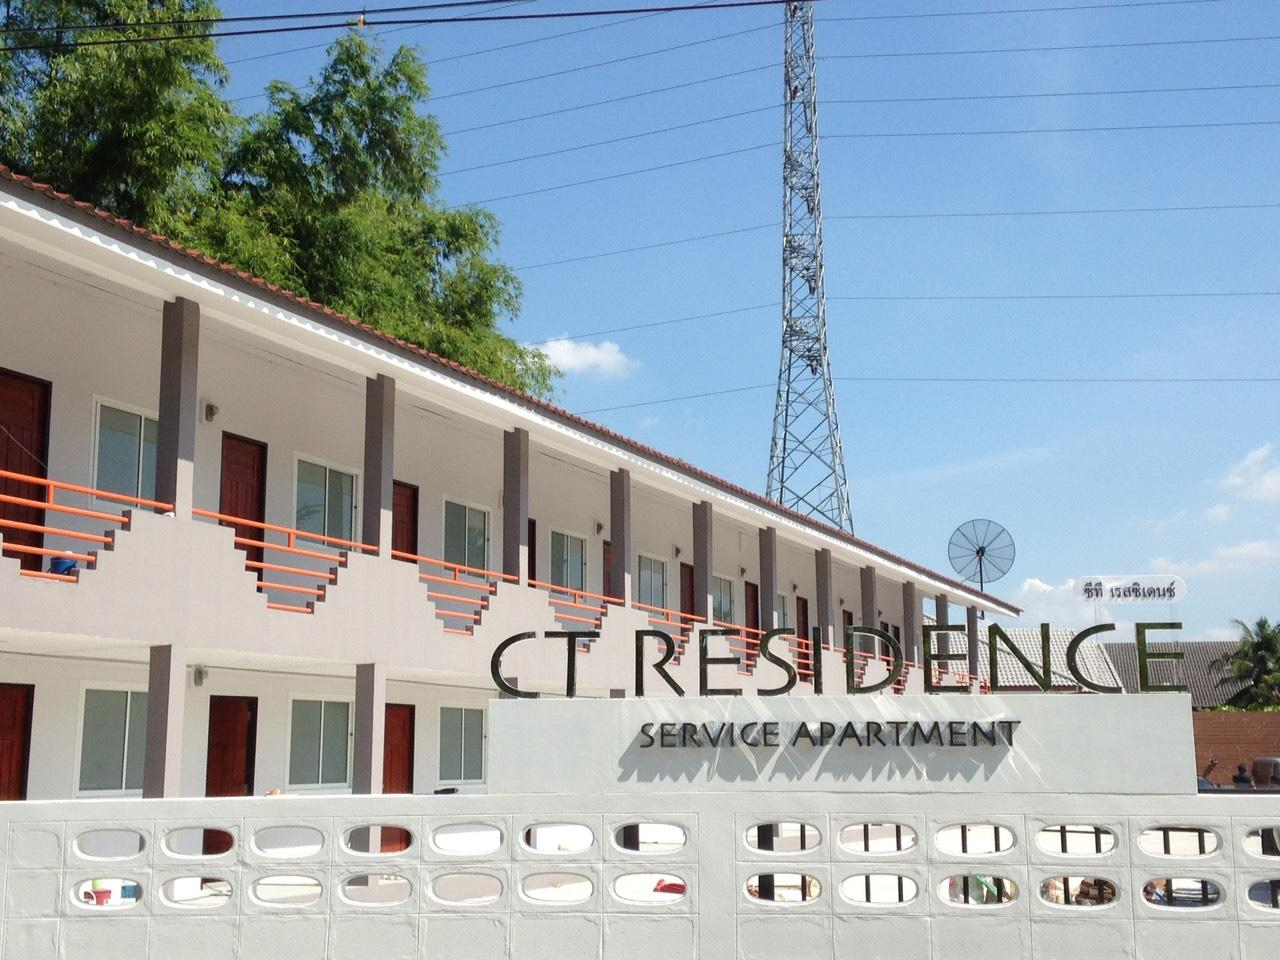 CT Residence,ซีที เรสซิเดนซ์